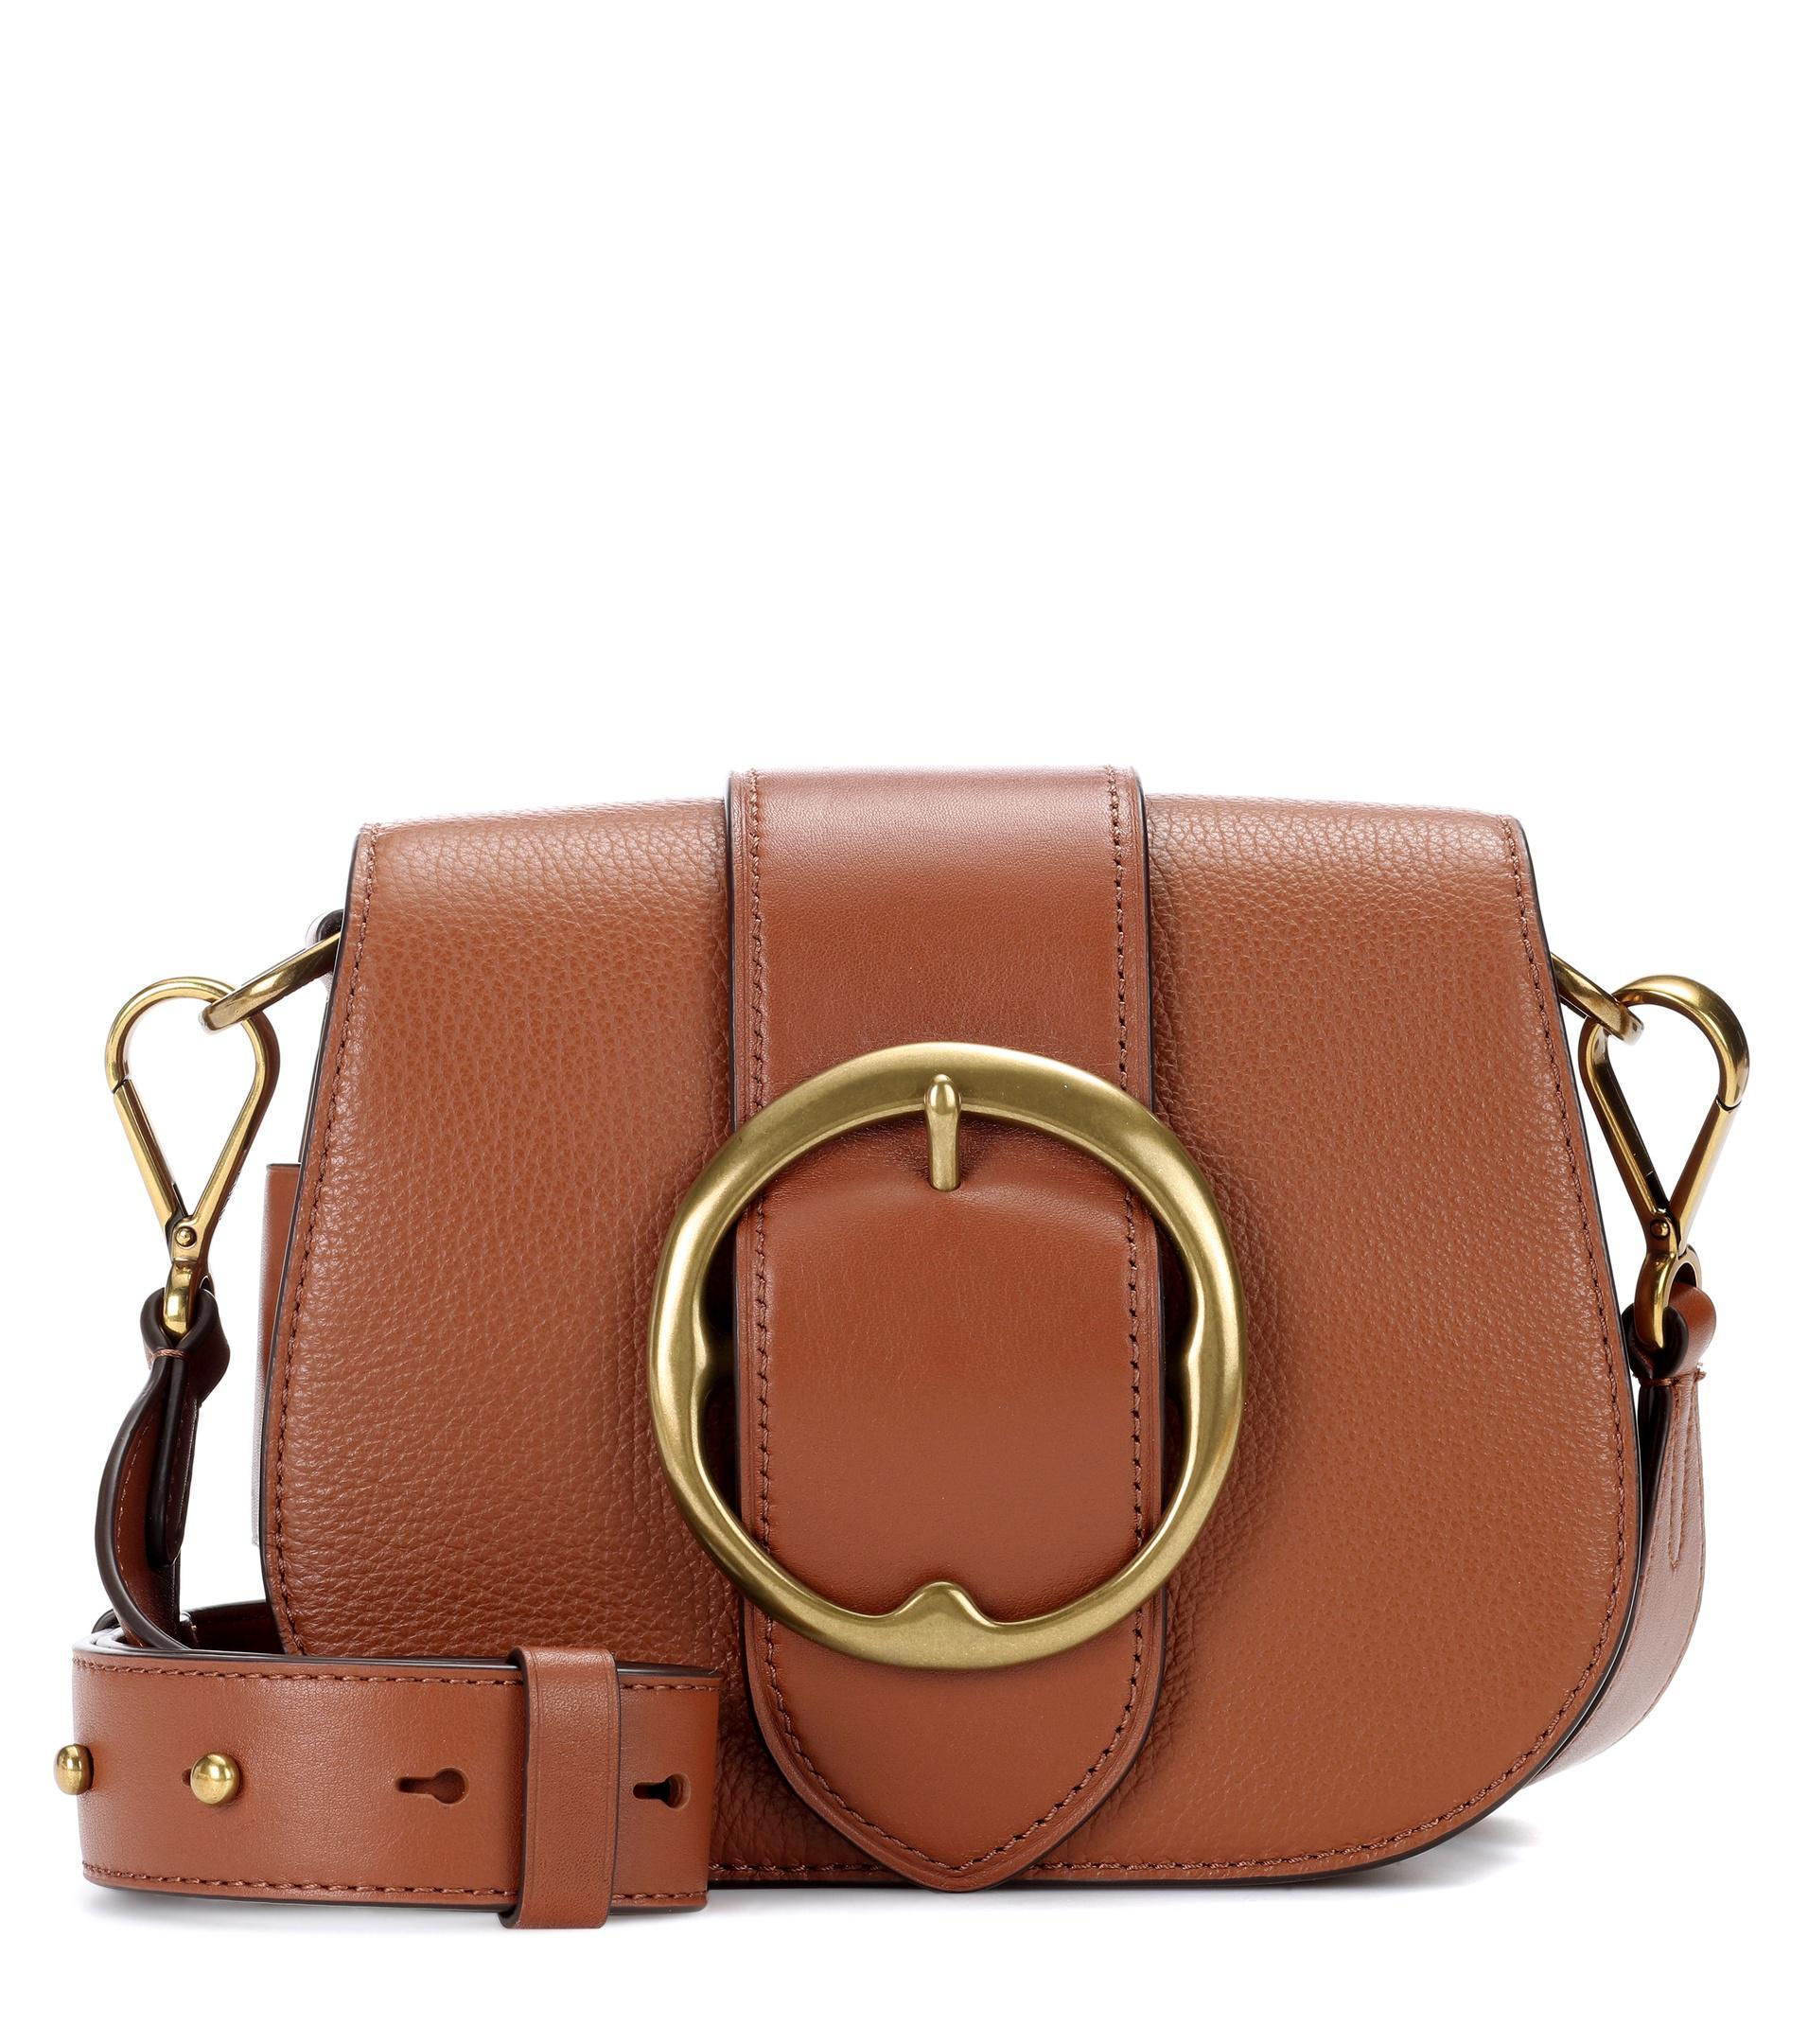 Polo Ralph Lauren Lennox Leather Shoulder Bag in Brown - Lyst 72d7ebd7f45b1